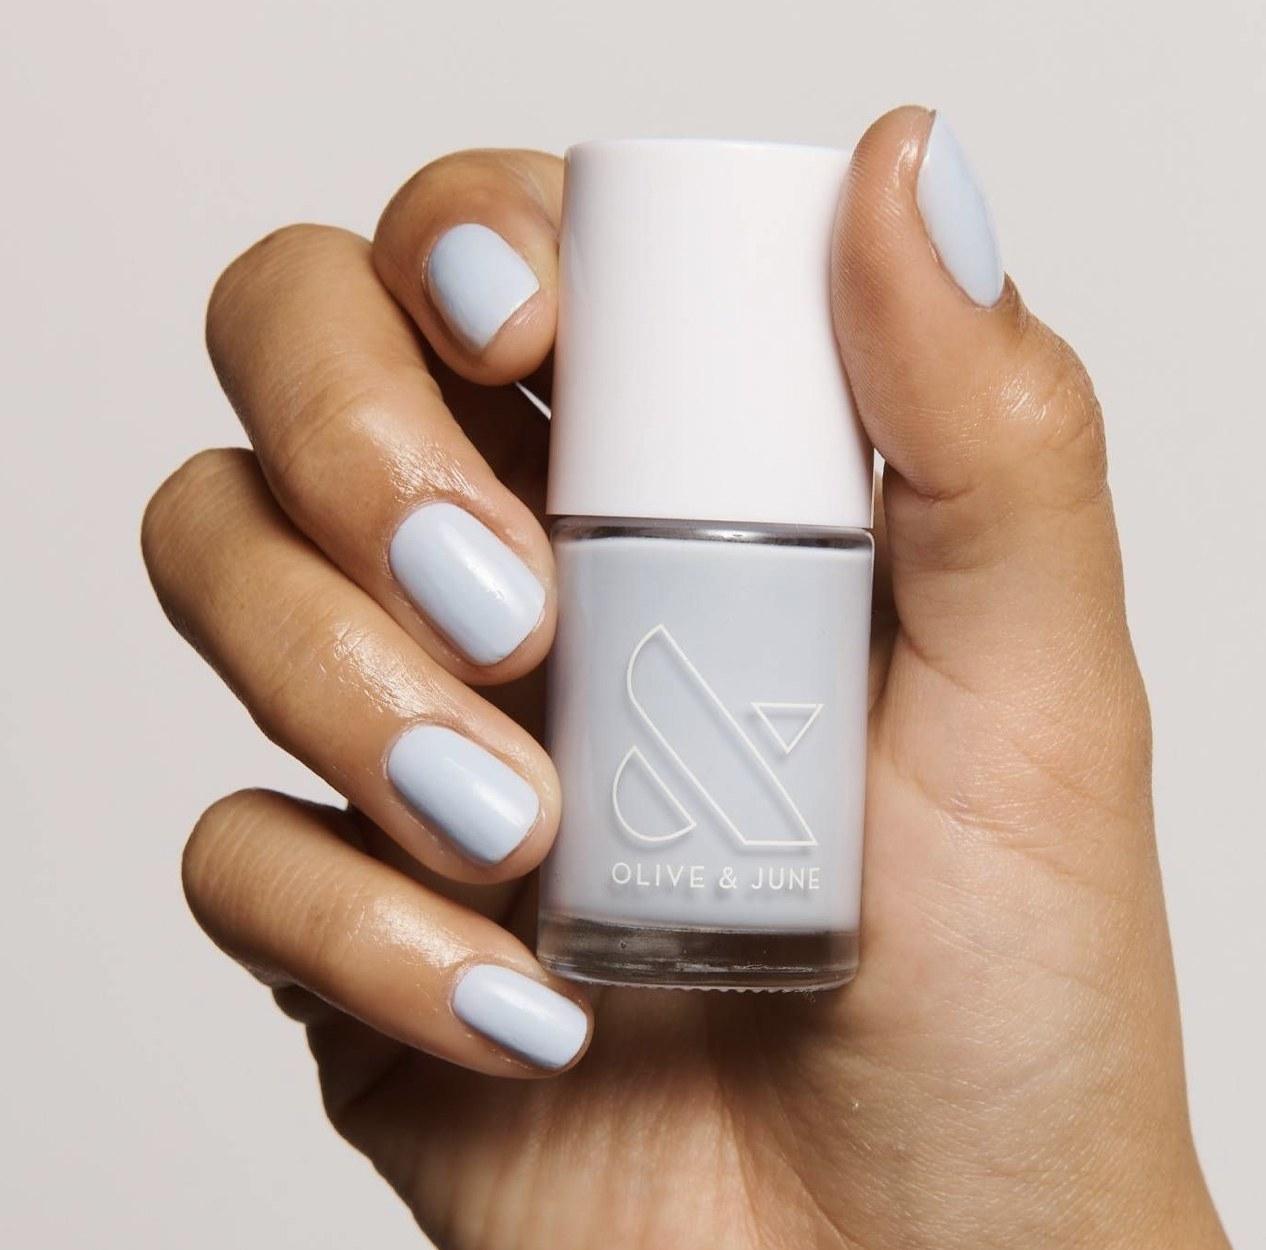 A woman's wearing a light blue manicure